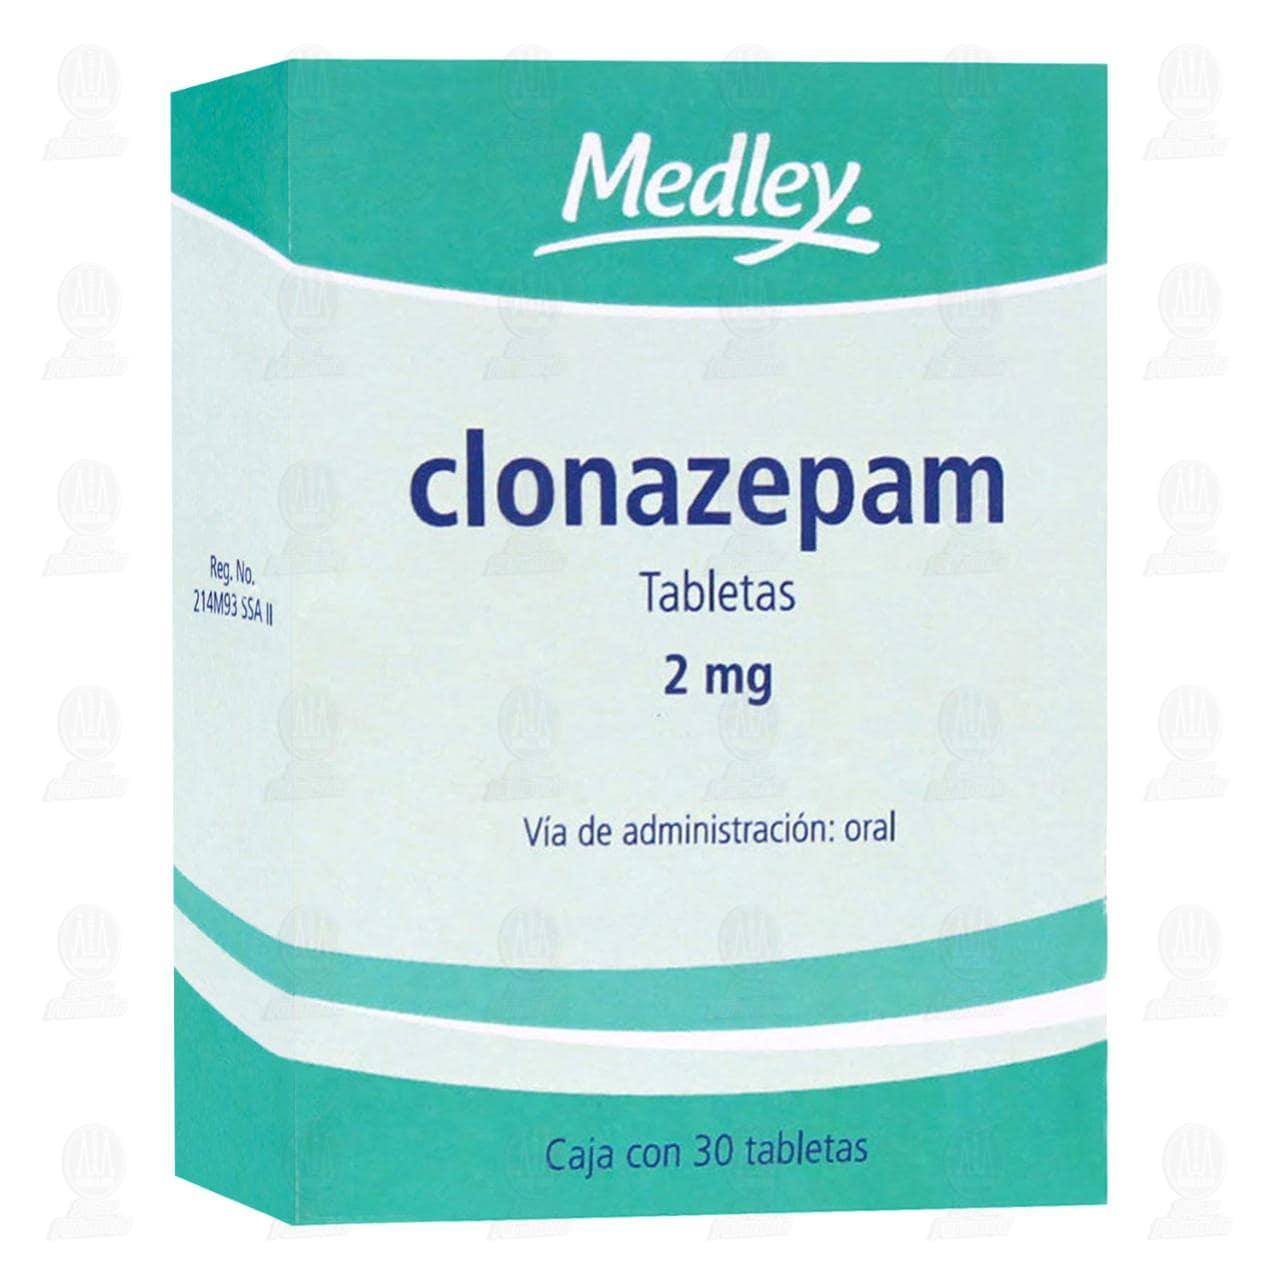 Clonazepam 2 mg 30 Tabletas